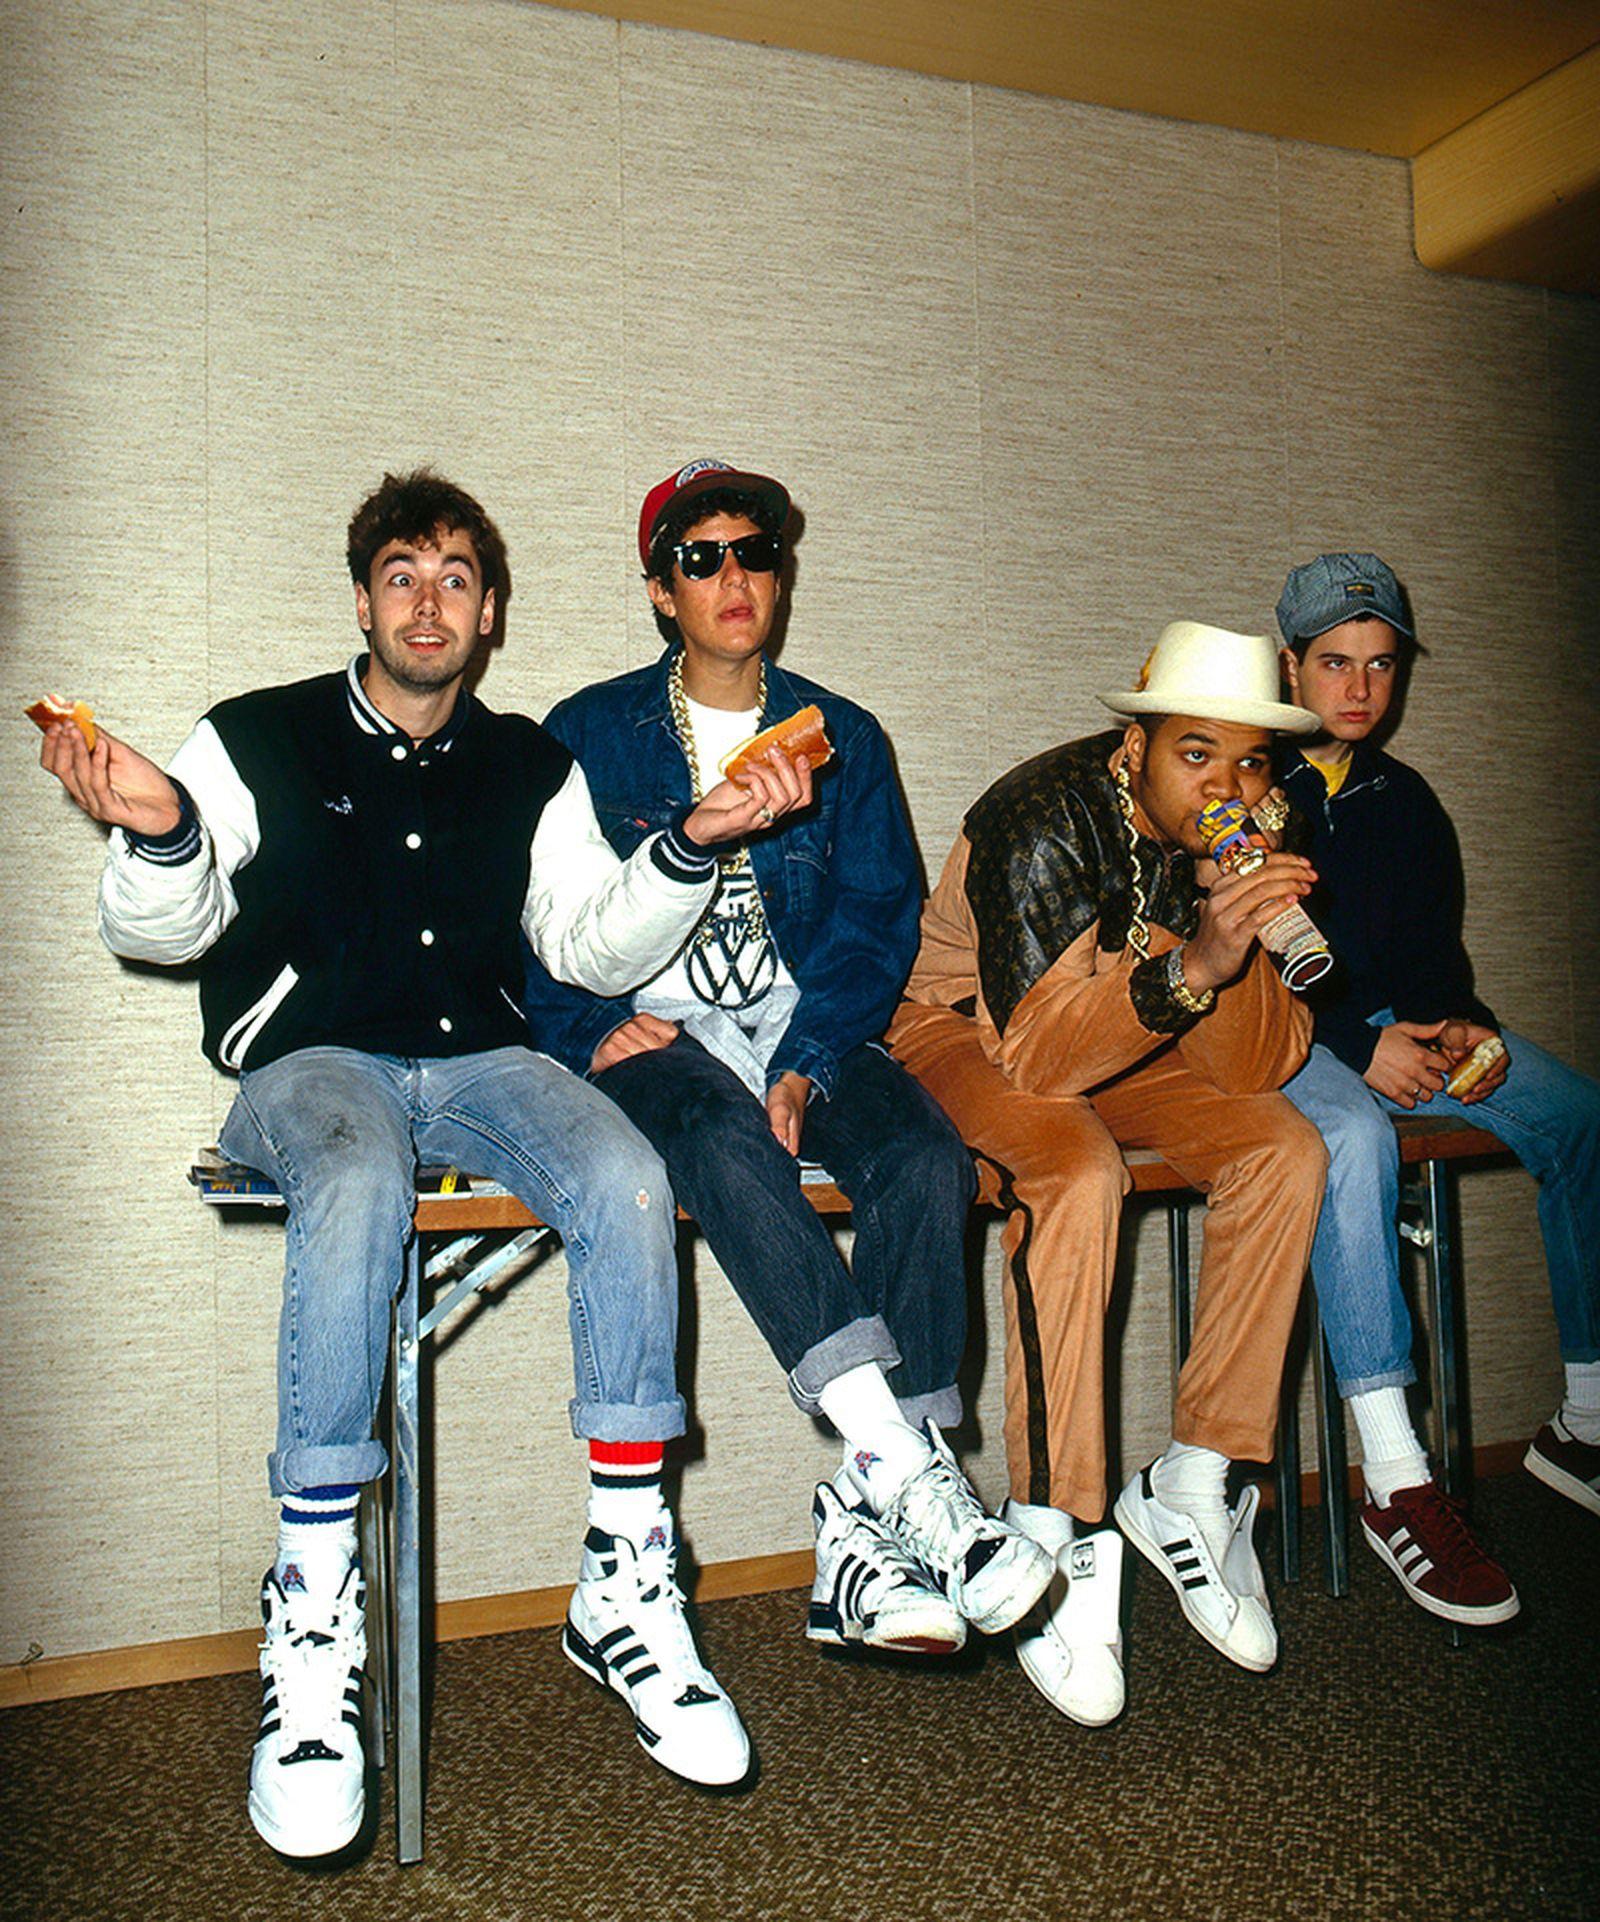 history-skinny-jeans-became-hip-hops-denim-choice-02